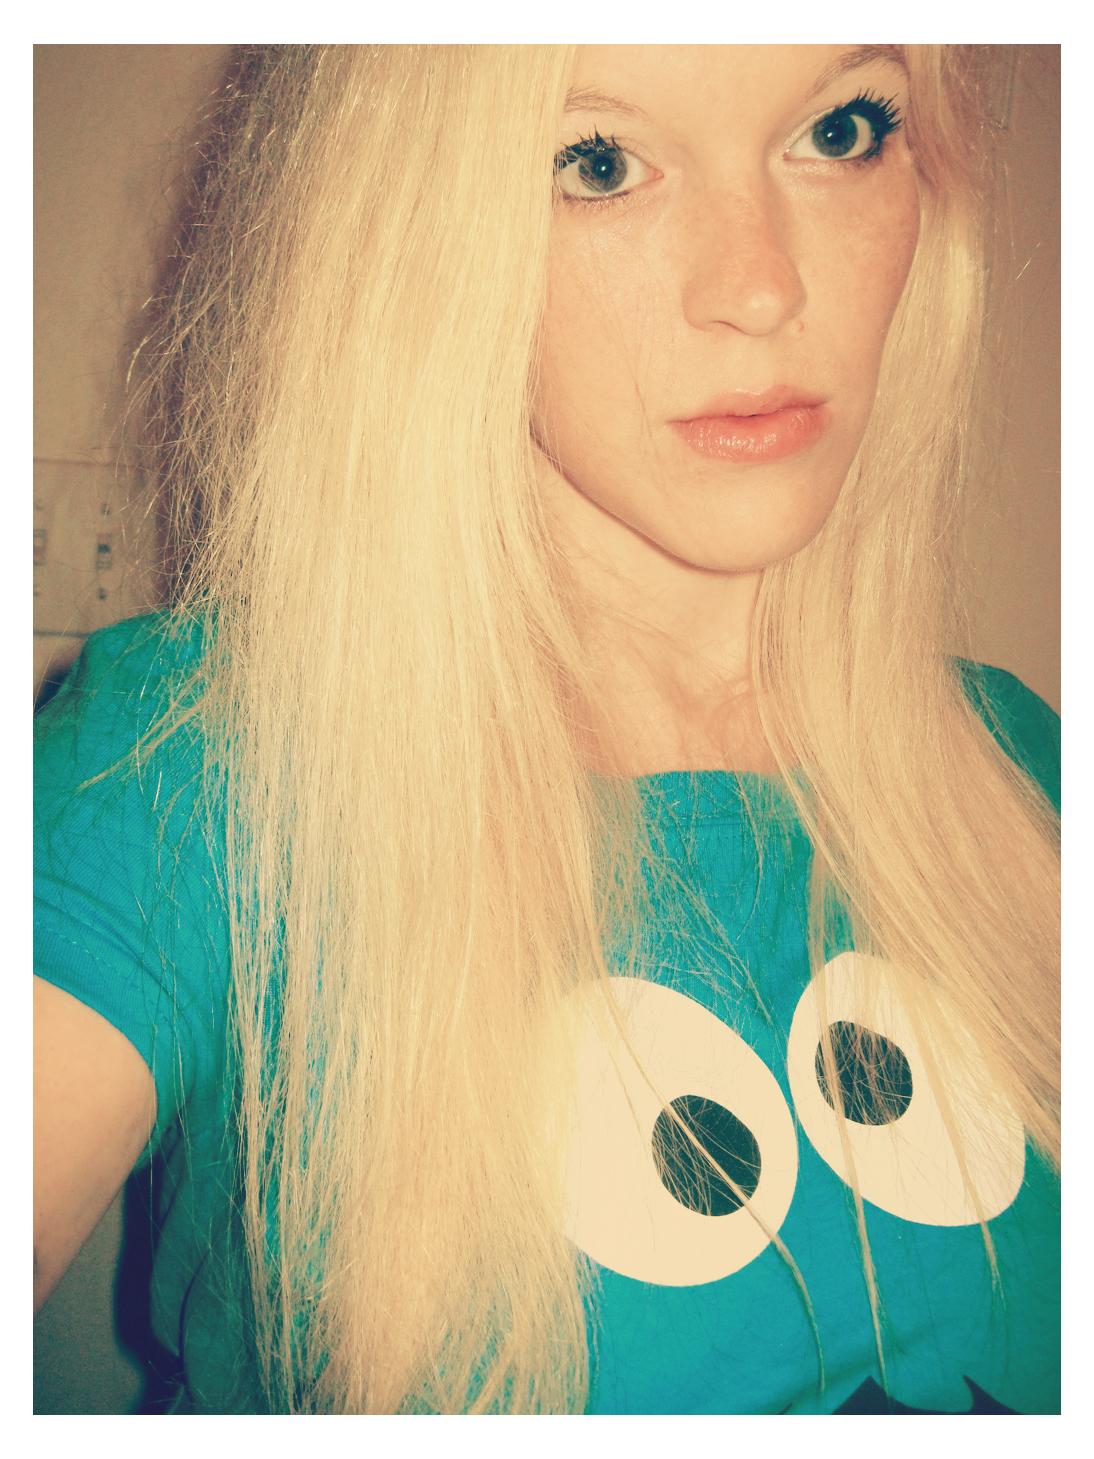 Blonde Woman Cookie Monster by ahtibat-stock